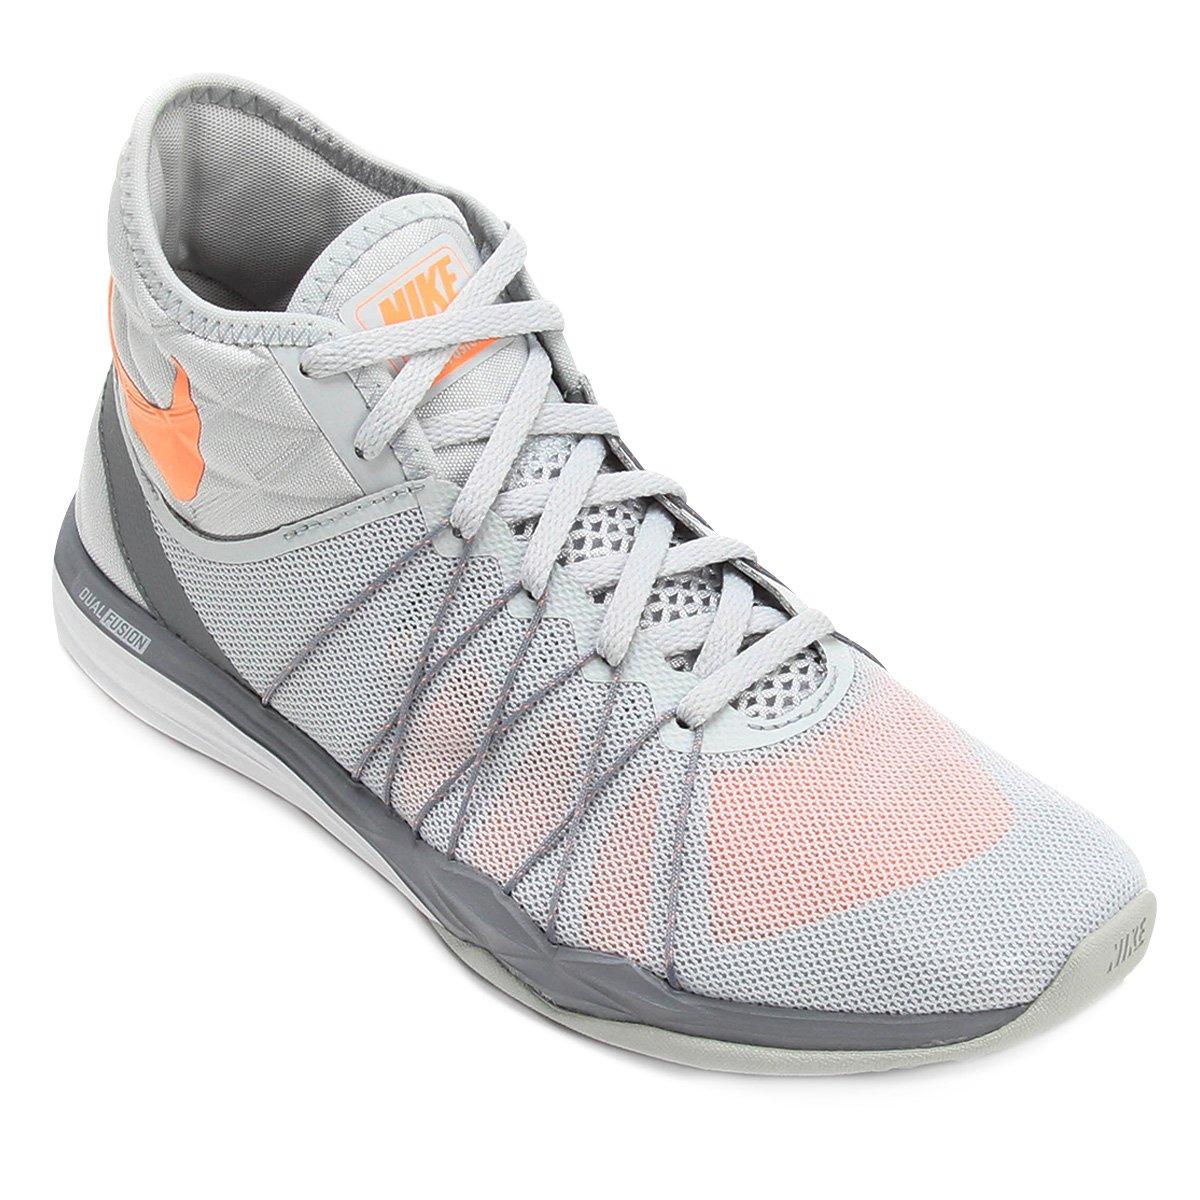 6248d79c5c4 Tênis Nike Dual Fusion TR Hit Feminino - Compre Agora